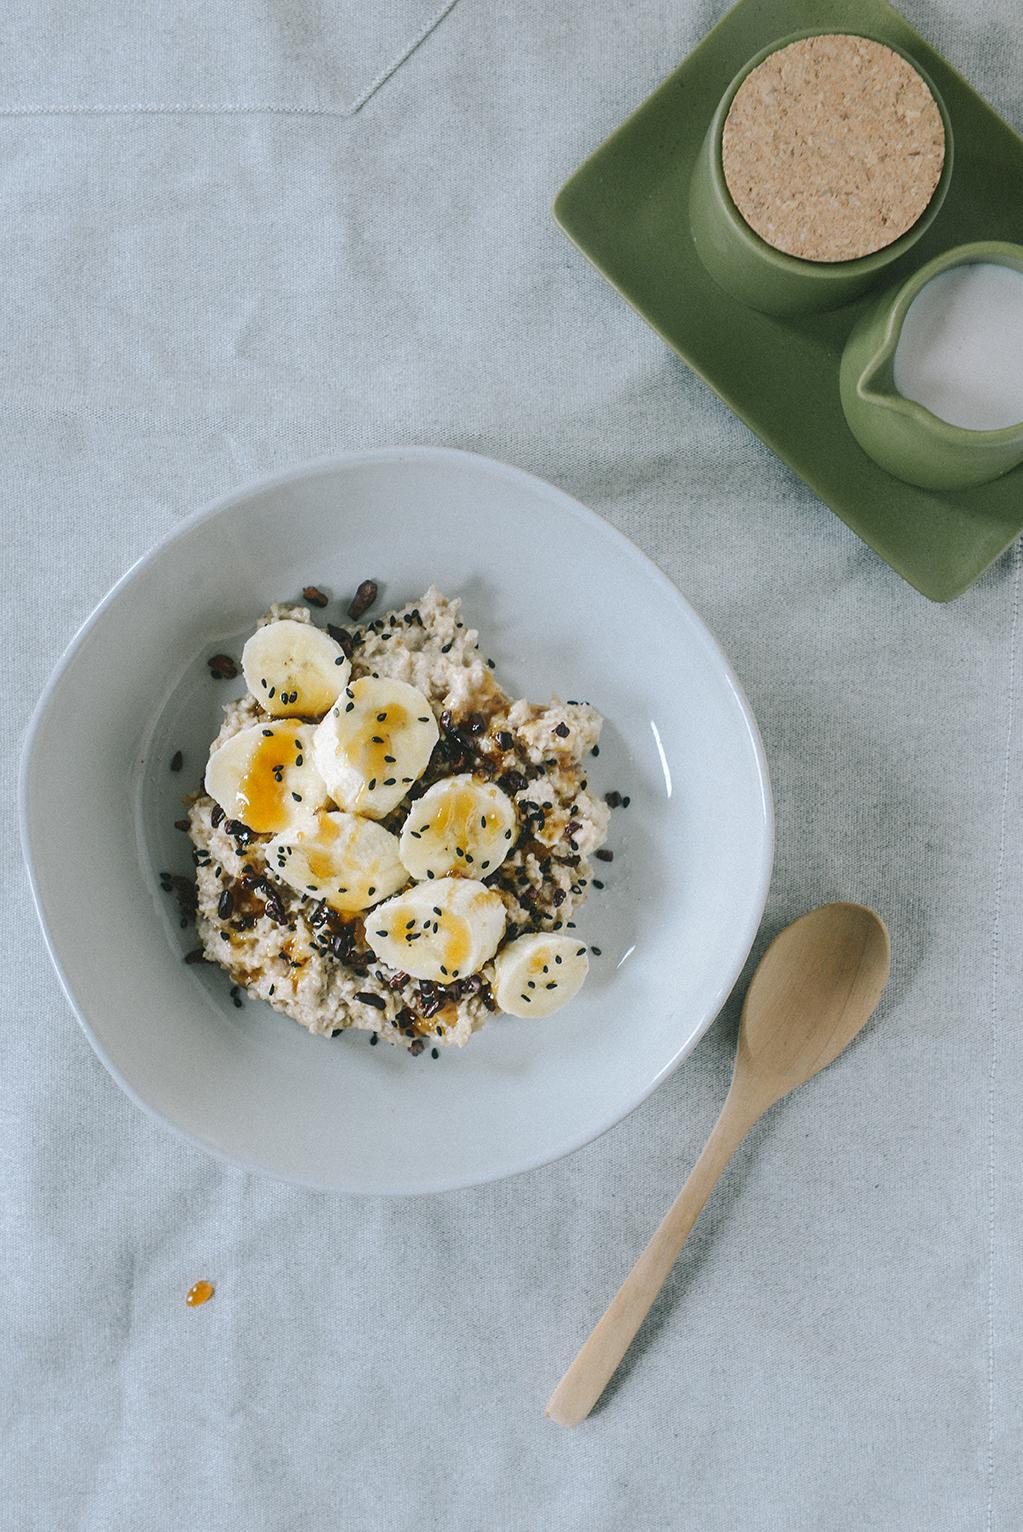 Gluten-Free Banana Tahini Porridge Inspired by London's 26 Grains // www.WithTheGrains.com